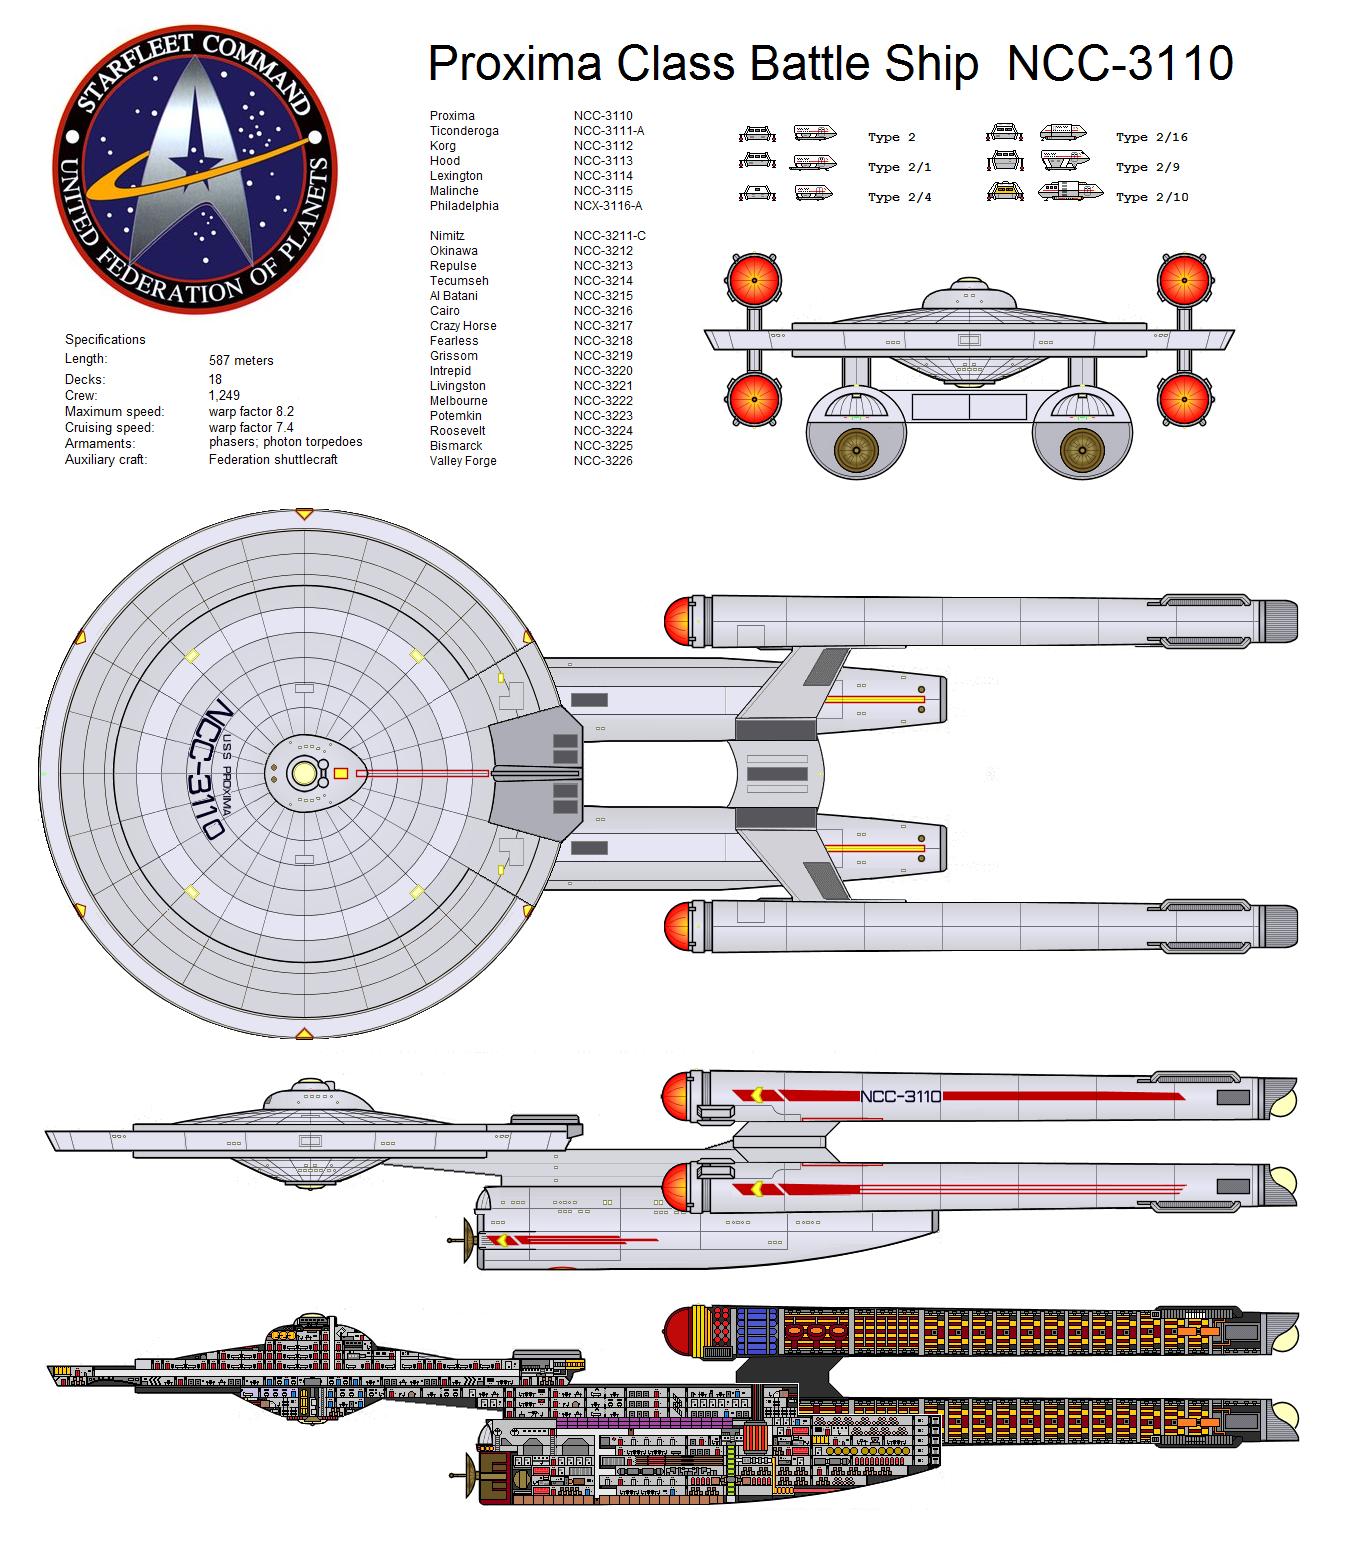 pin federation starfleet class - photo #25